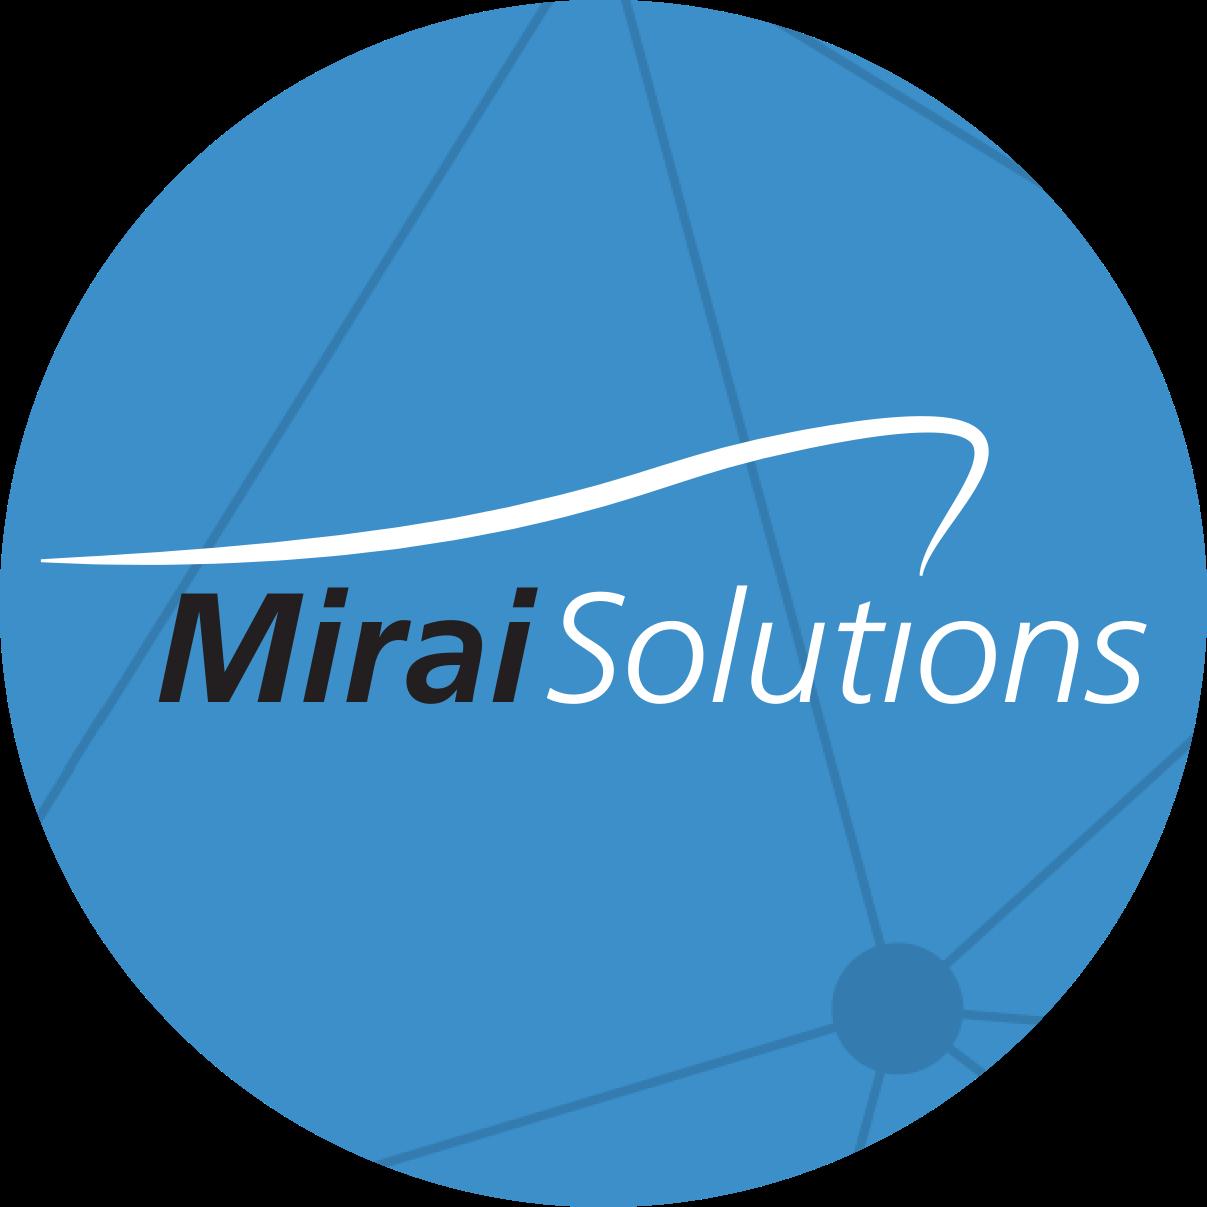 Mirai Solutions